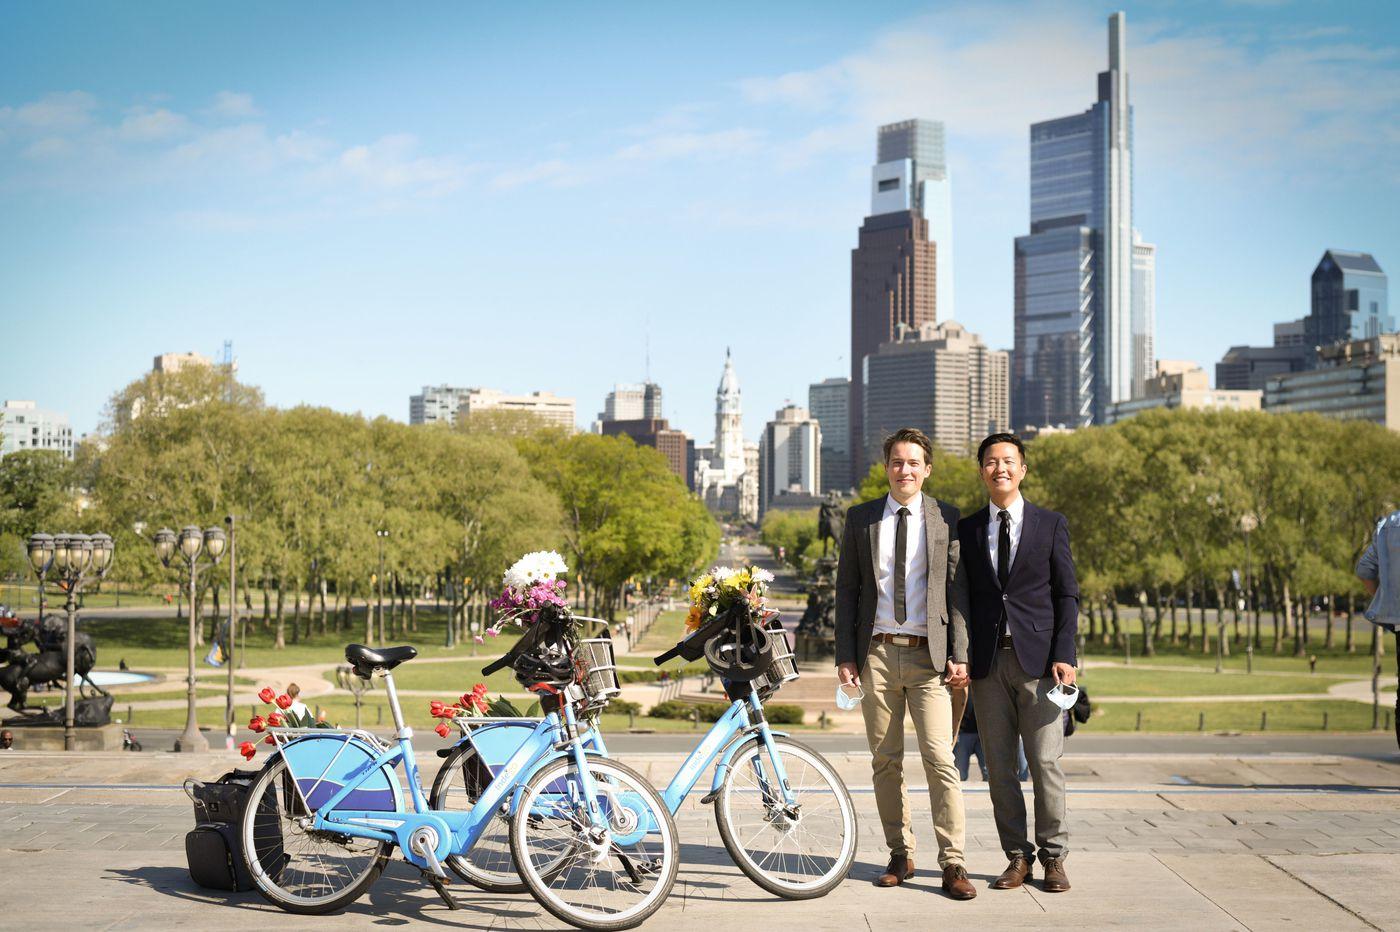 From an ocean apart to just 9 feet: Cedric Huchuan Xia & Erik Lorenz